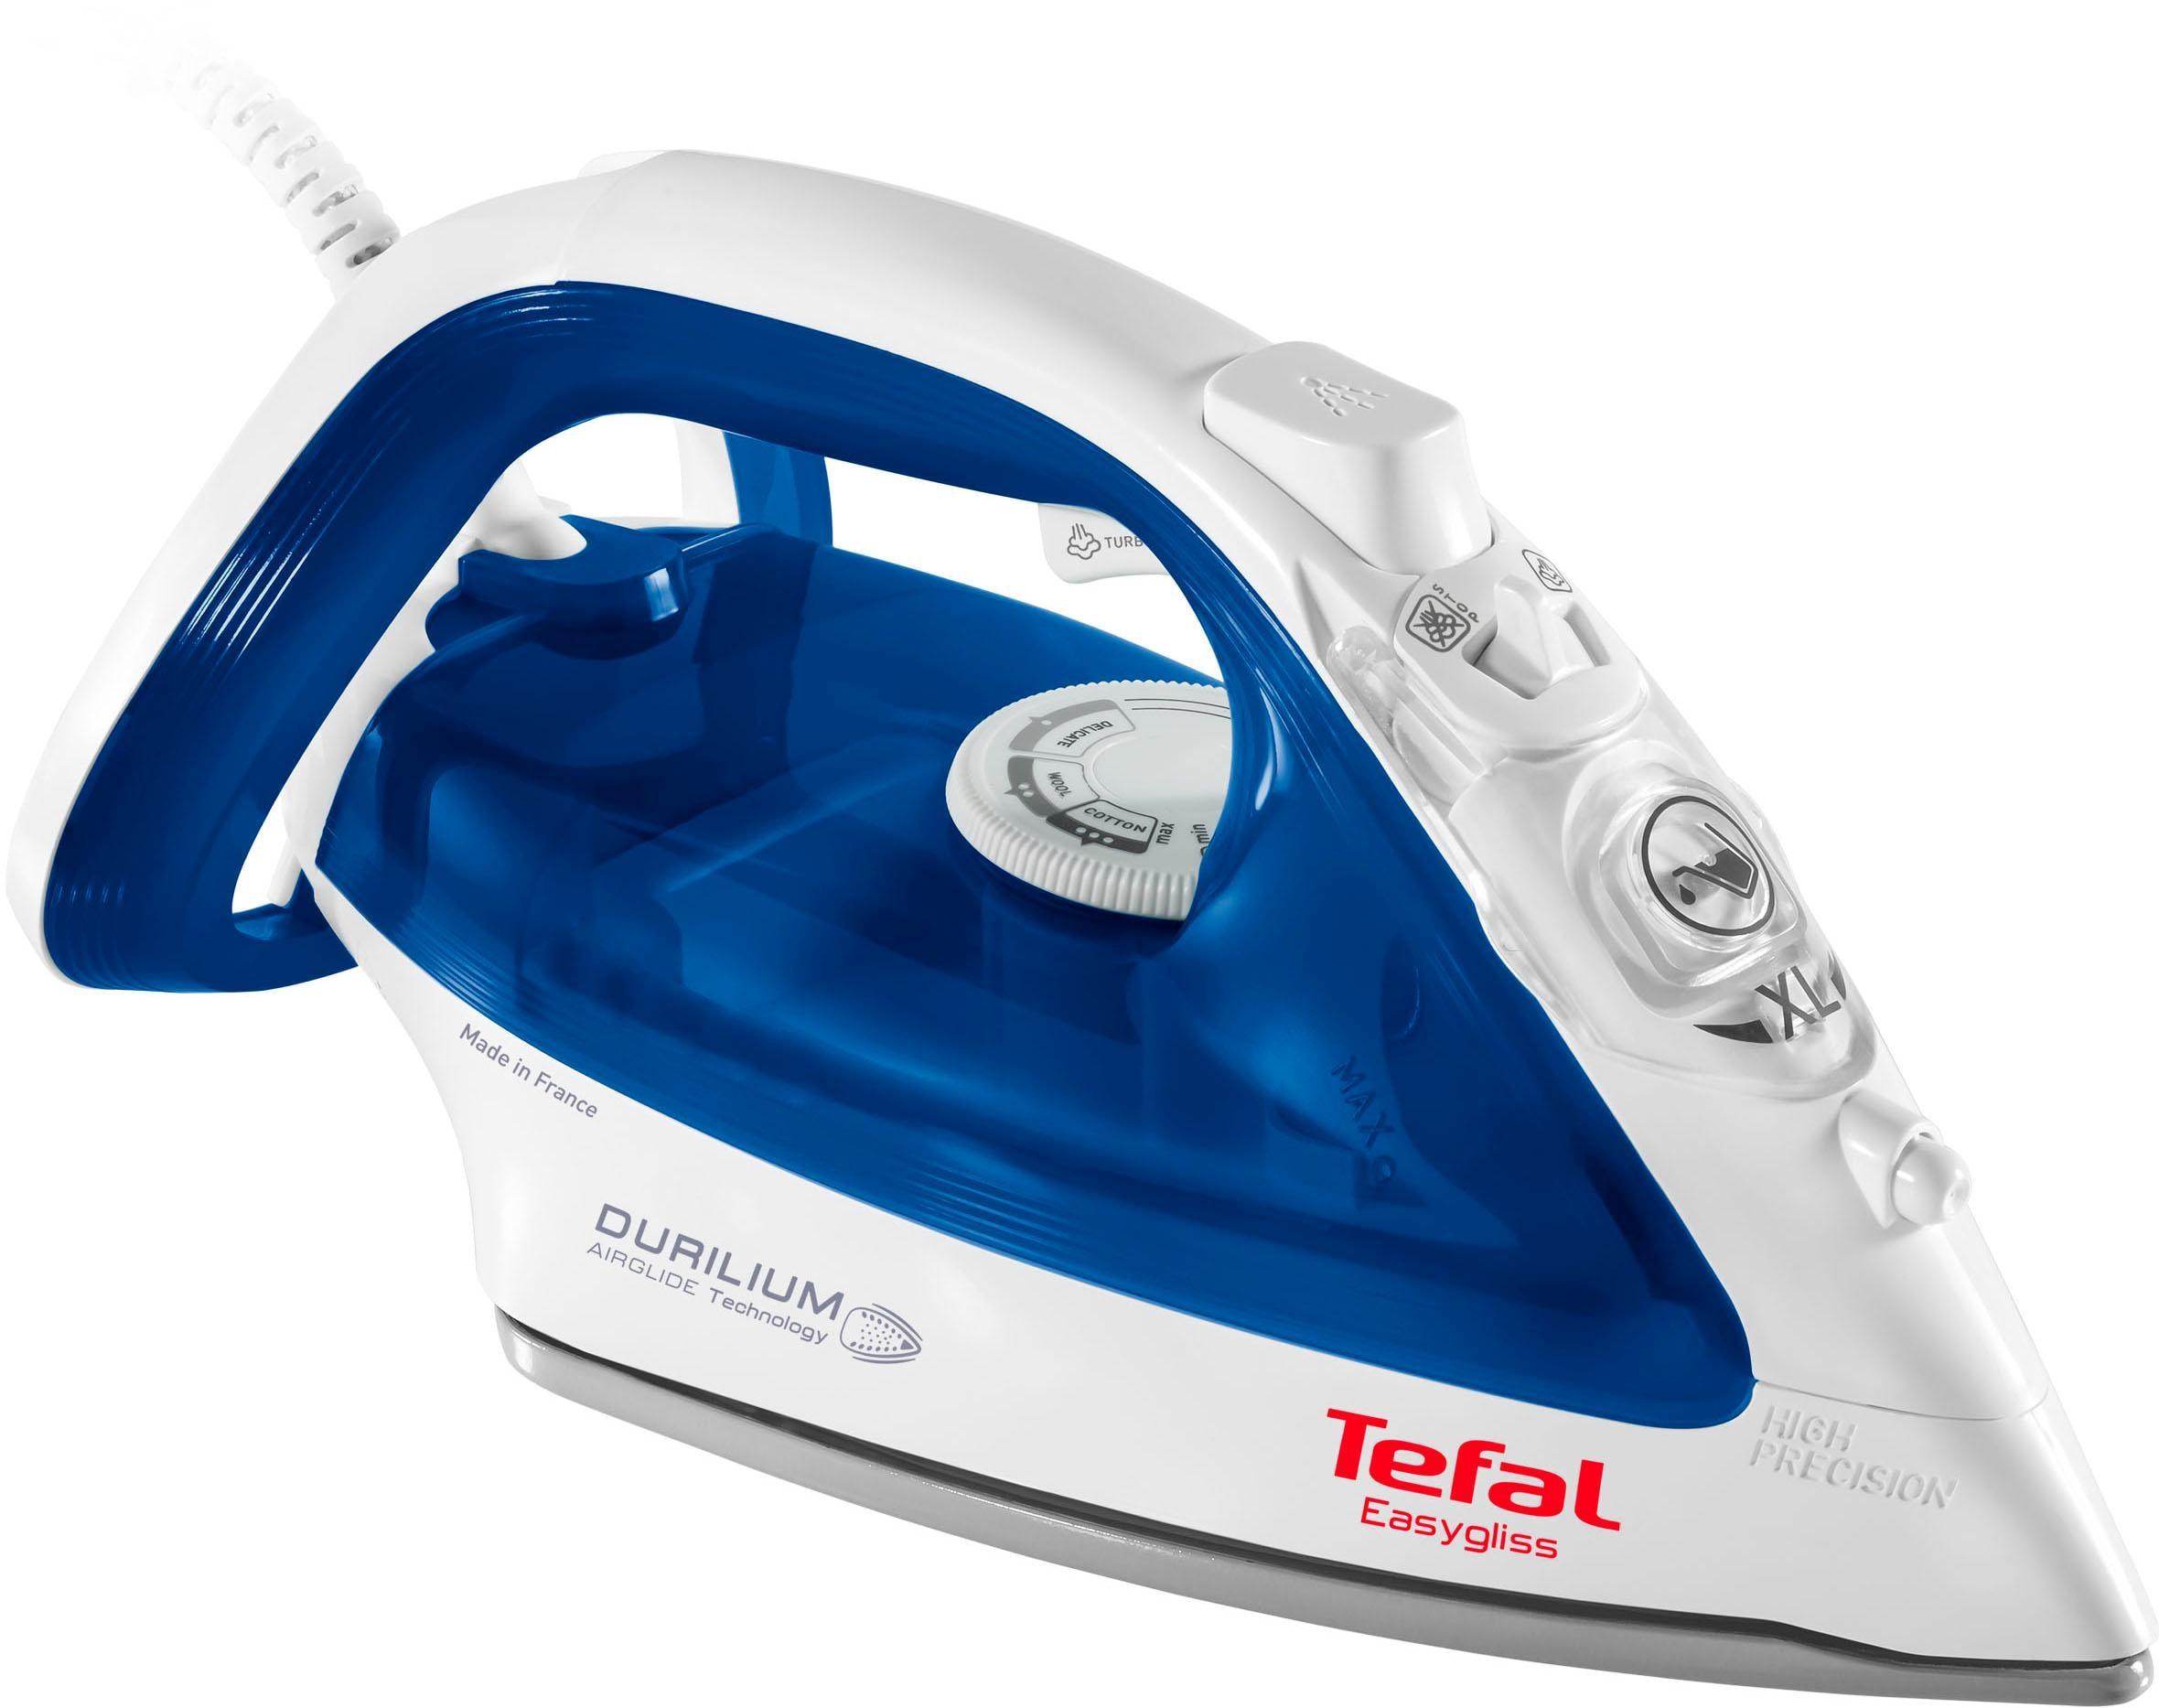 Tefal Dampfbügeleisen FV3960 Easygliss, 2400 Watt | Flur & Diele > Haushaltsgeräte > Bügeleisen | Weiß | TEFAL